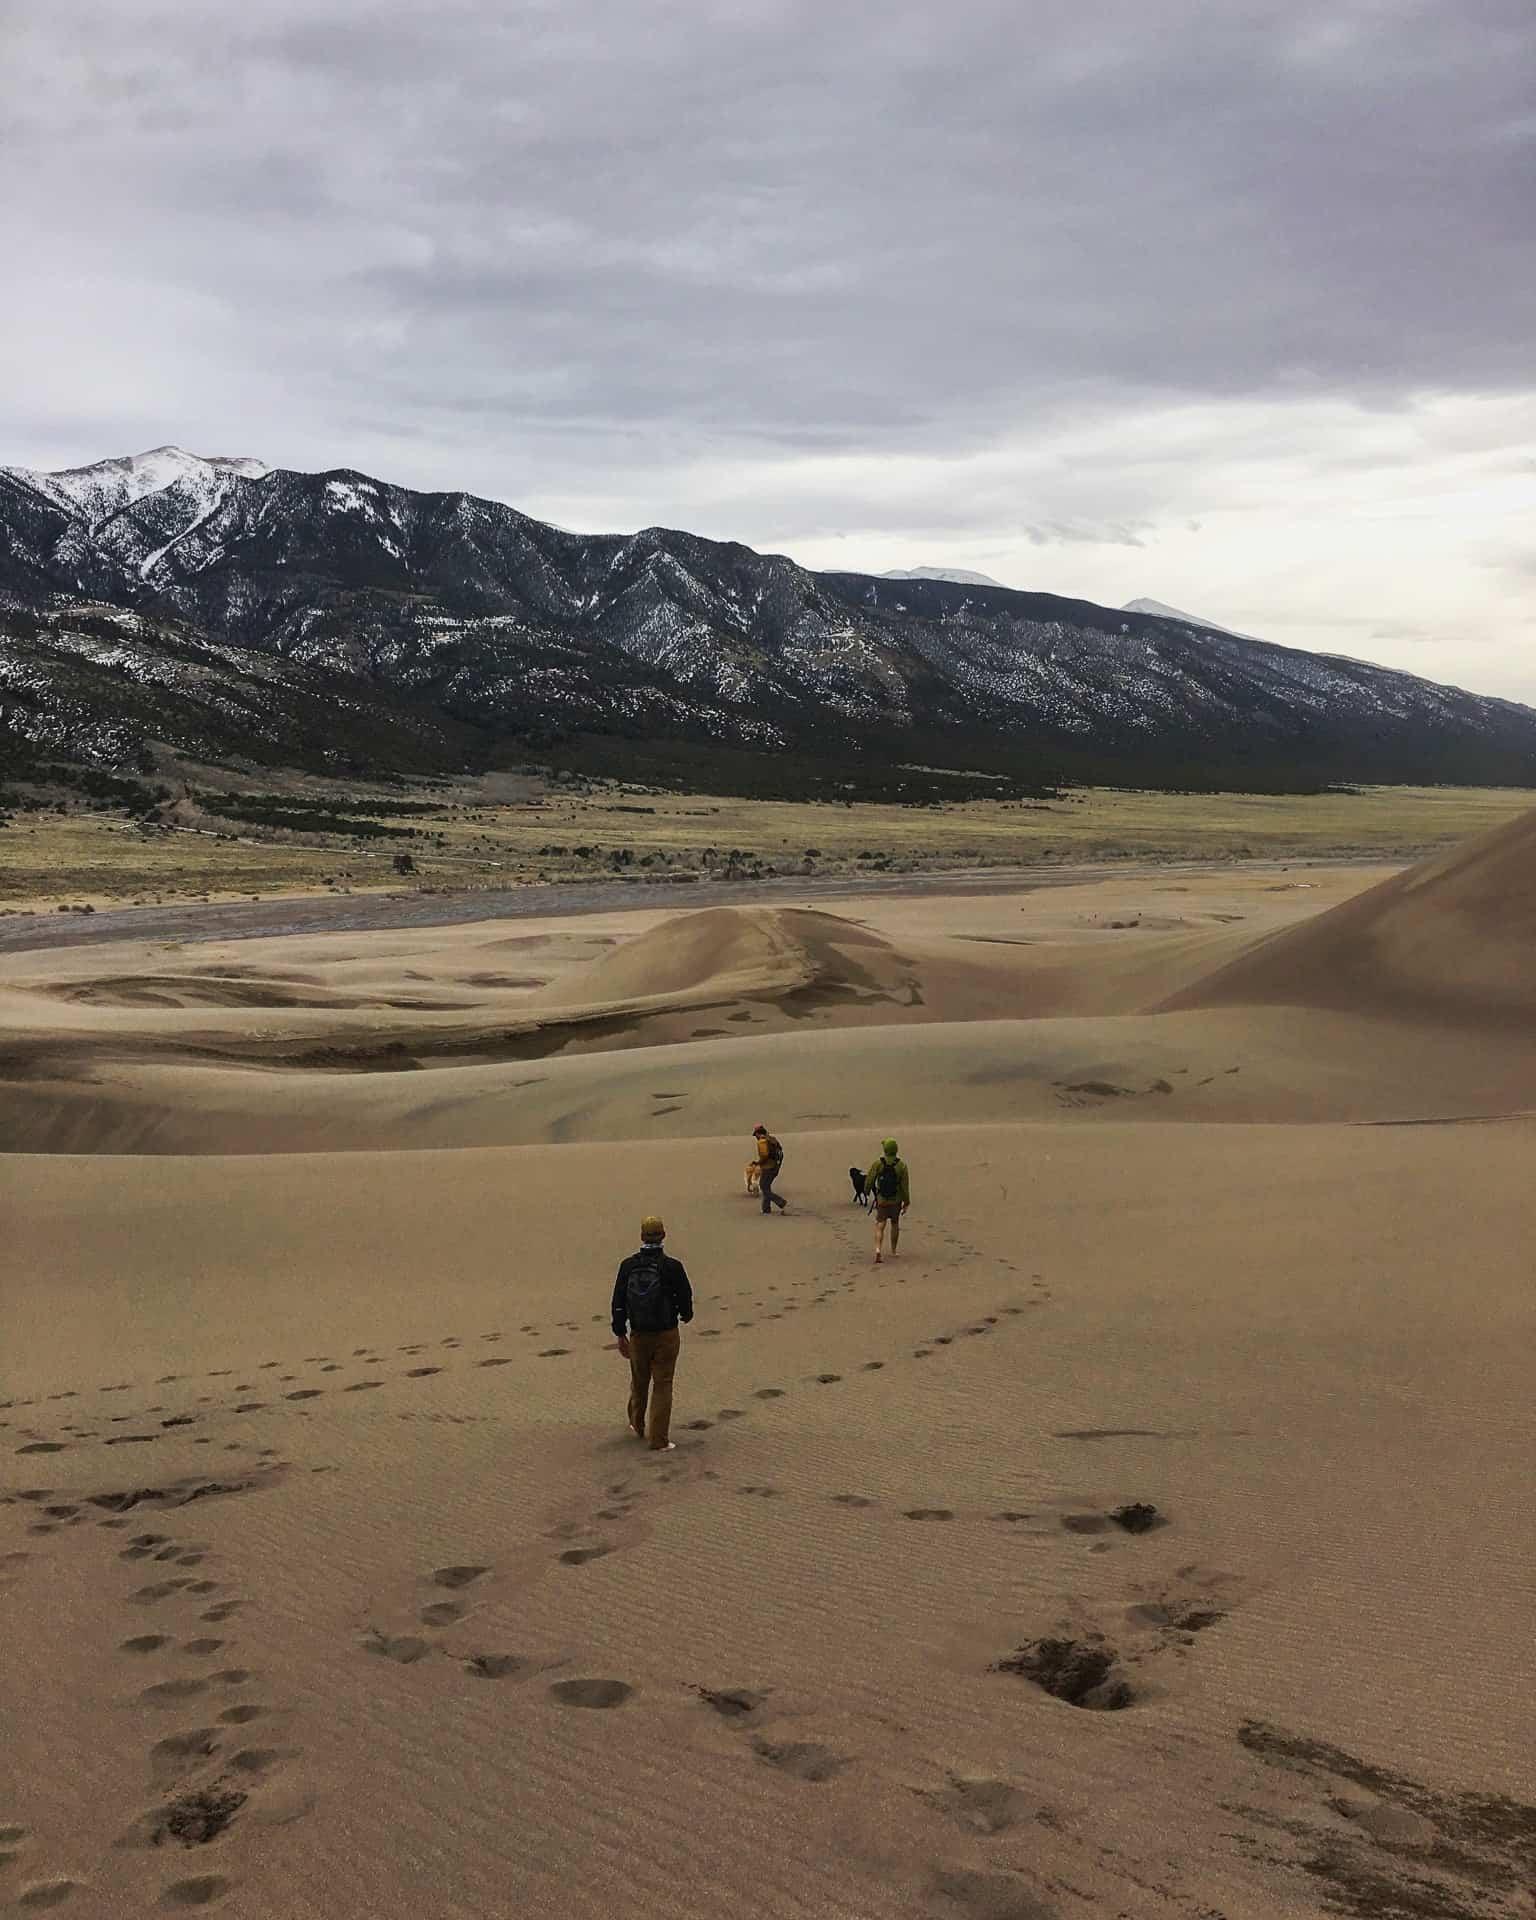 Colorado Road Trip: Great Sand Dunes National Park